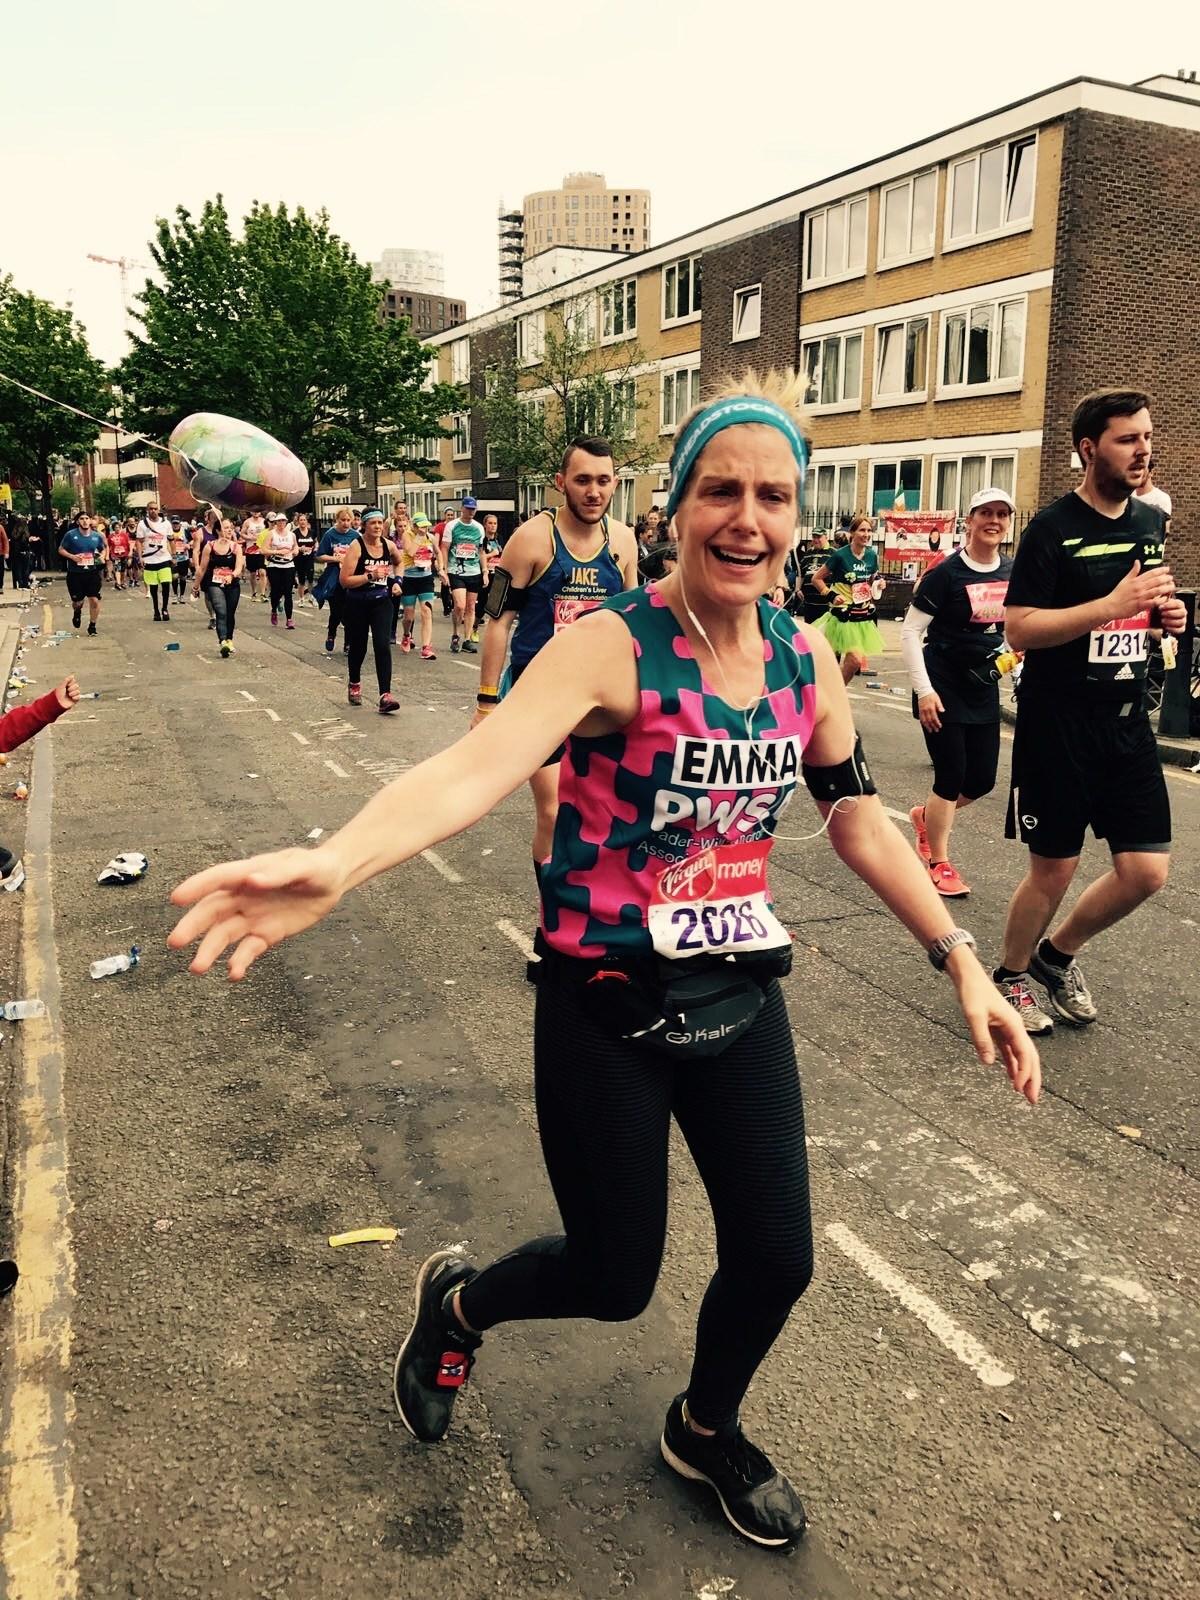 Virgin Money London Marathon – the day after!